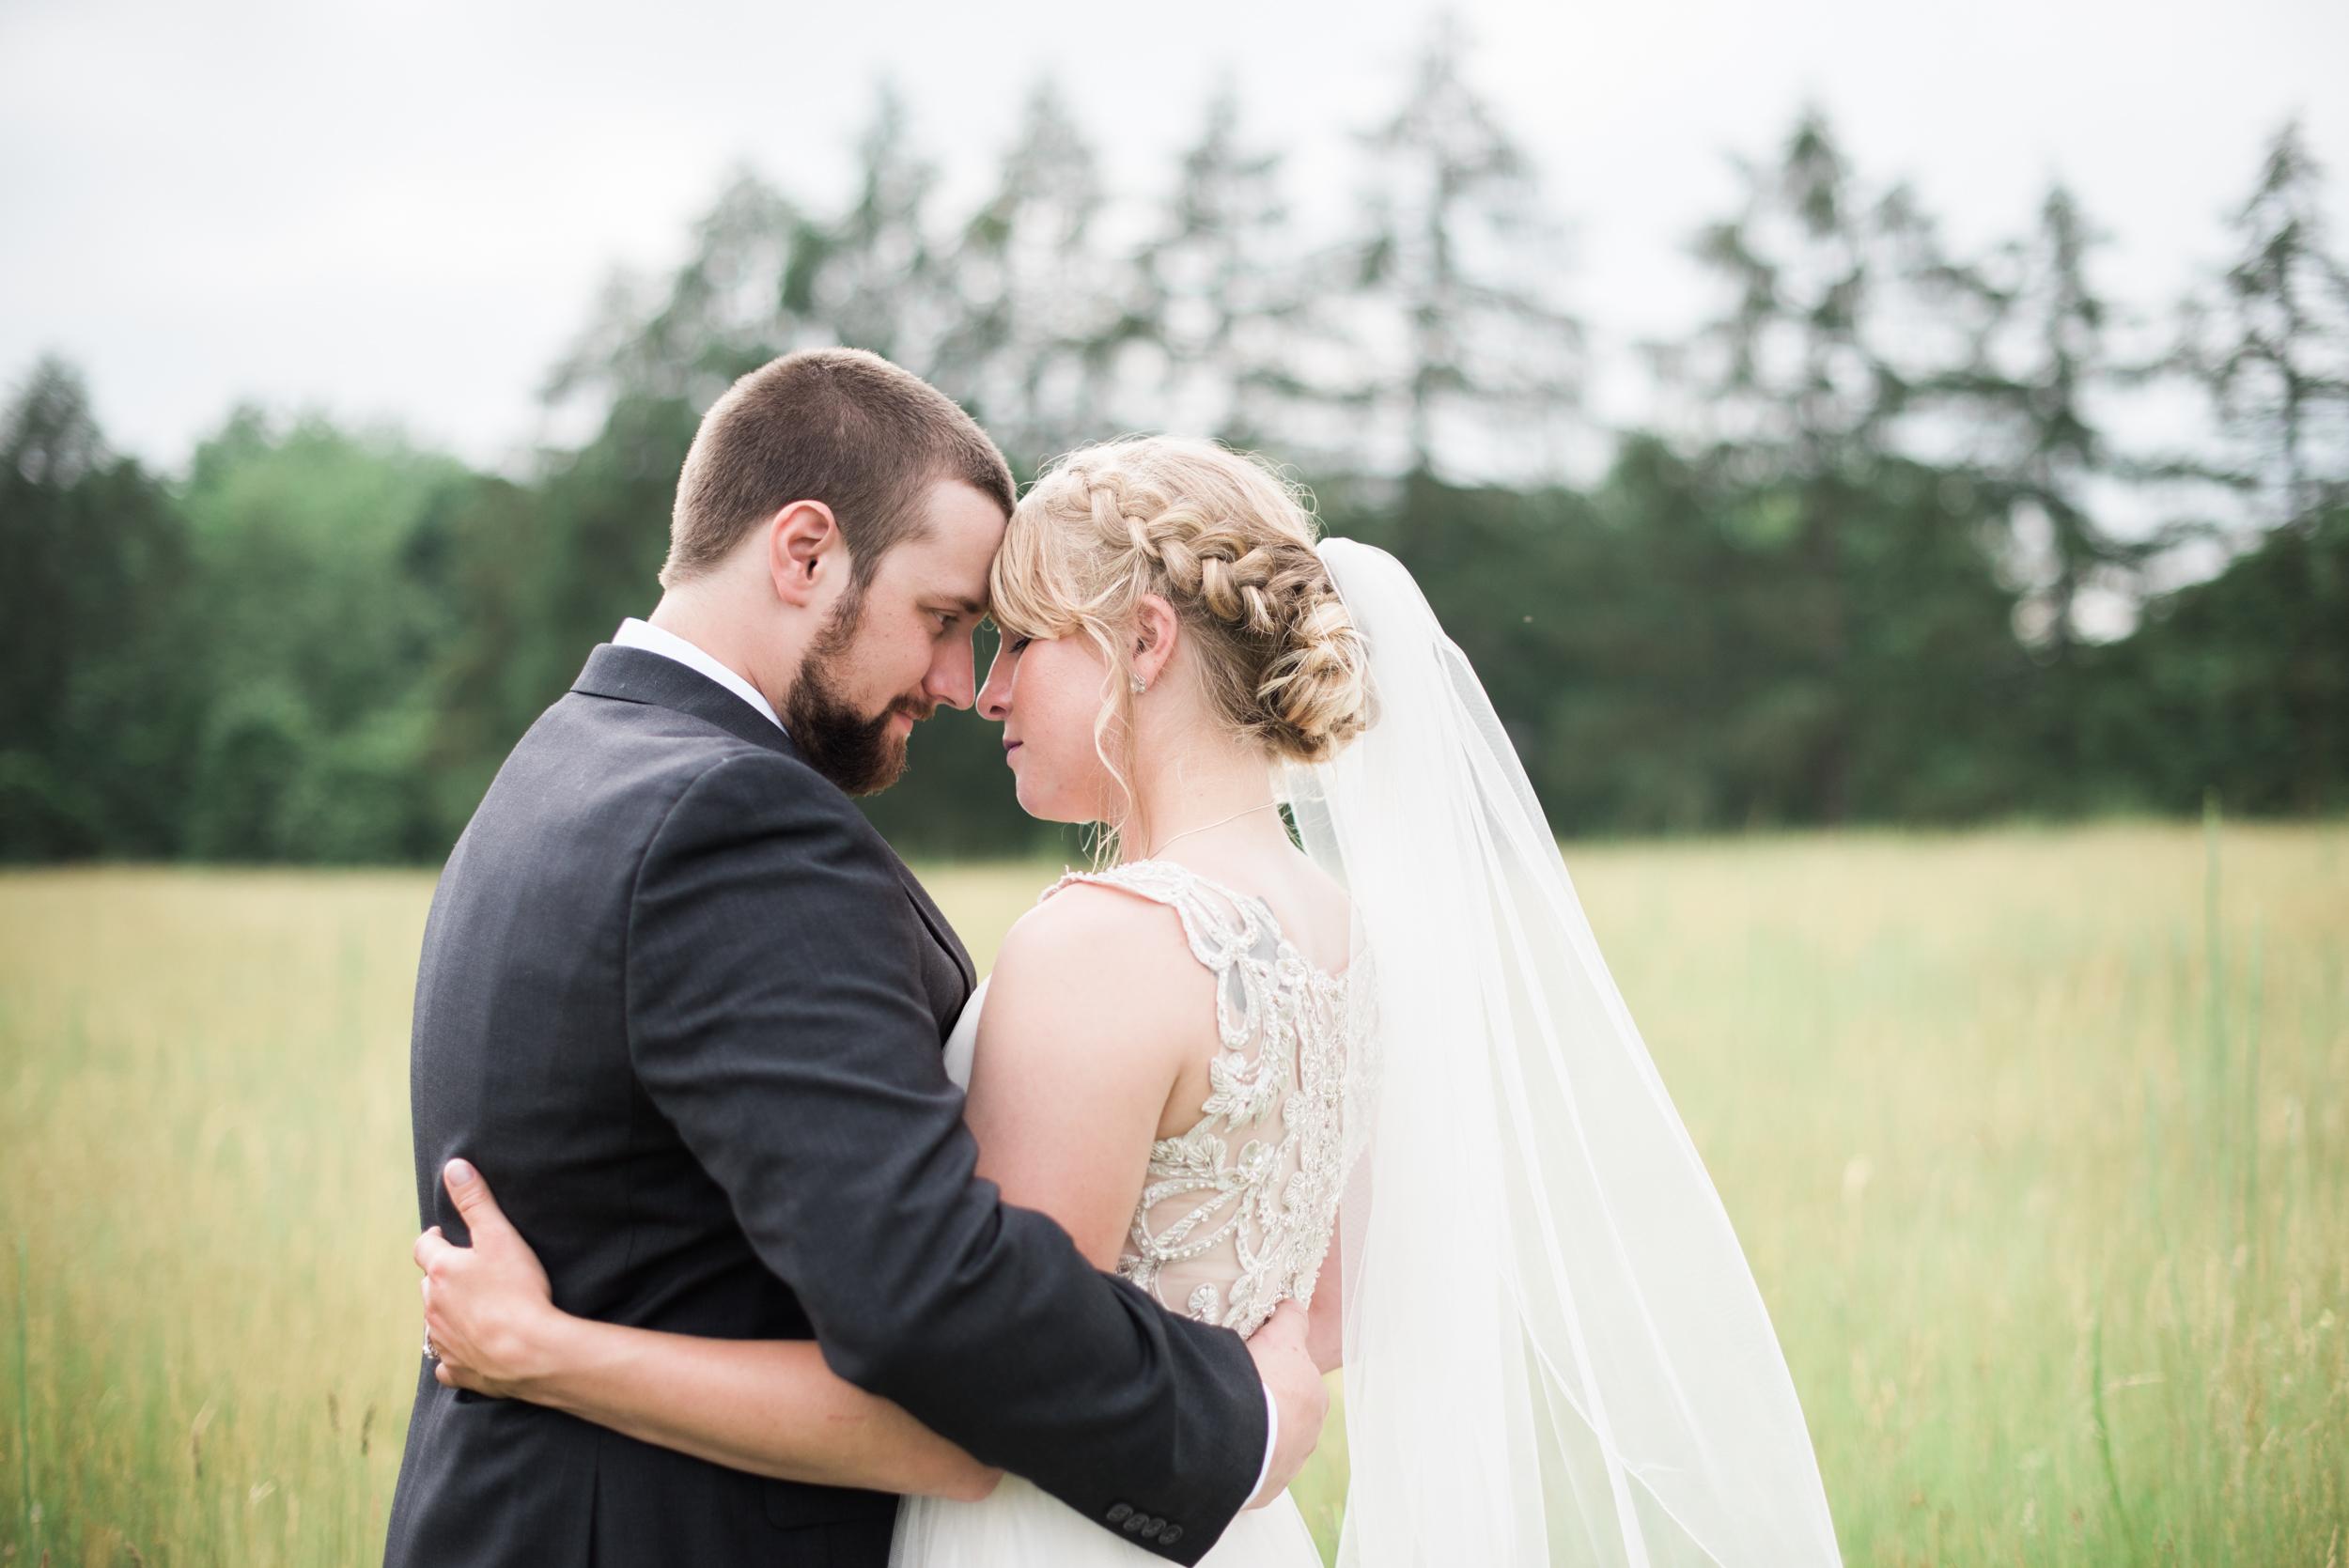 Fine Art wedding Photographer in Amherst MA